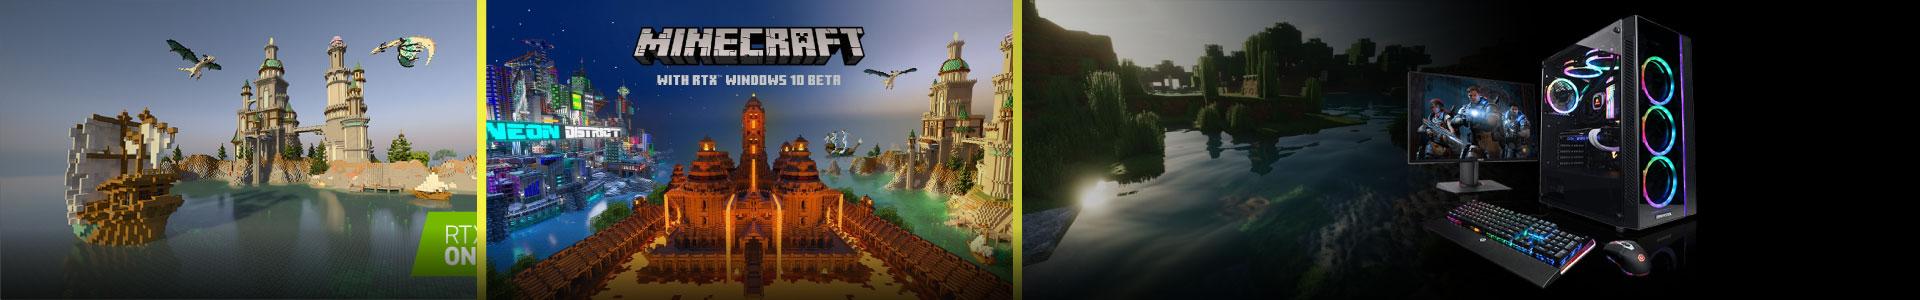 Minecraft (RTX)